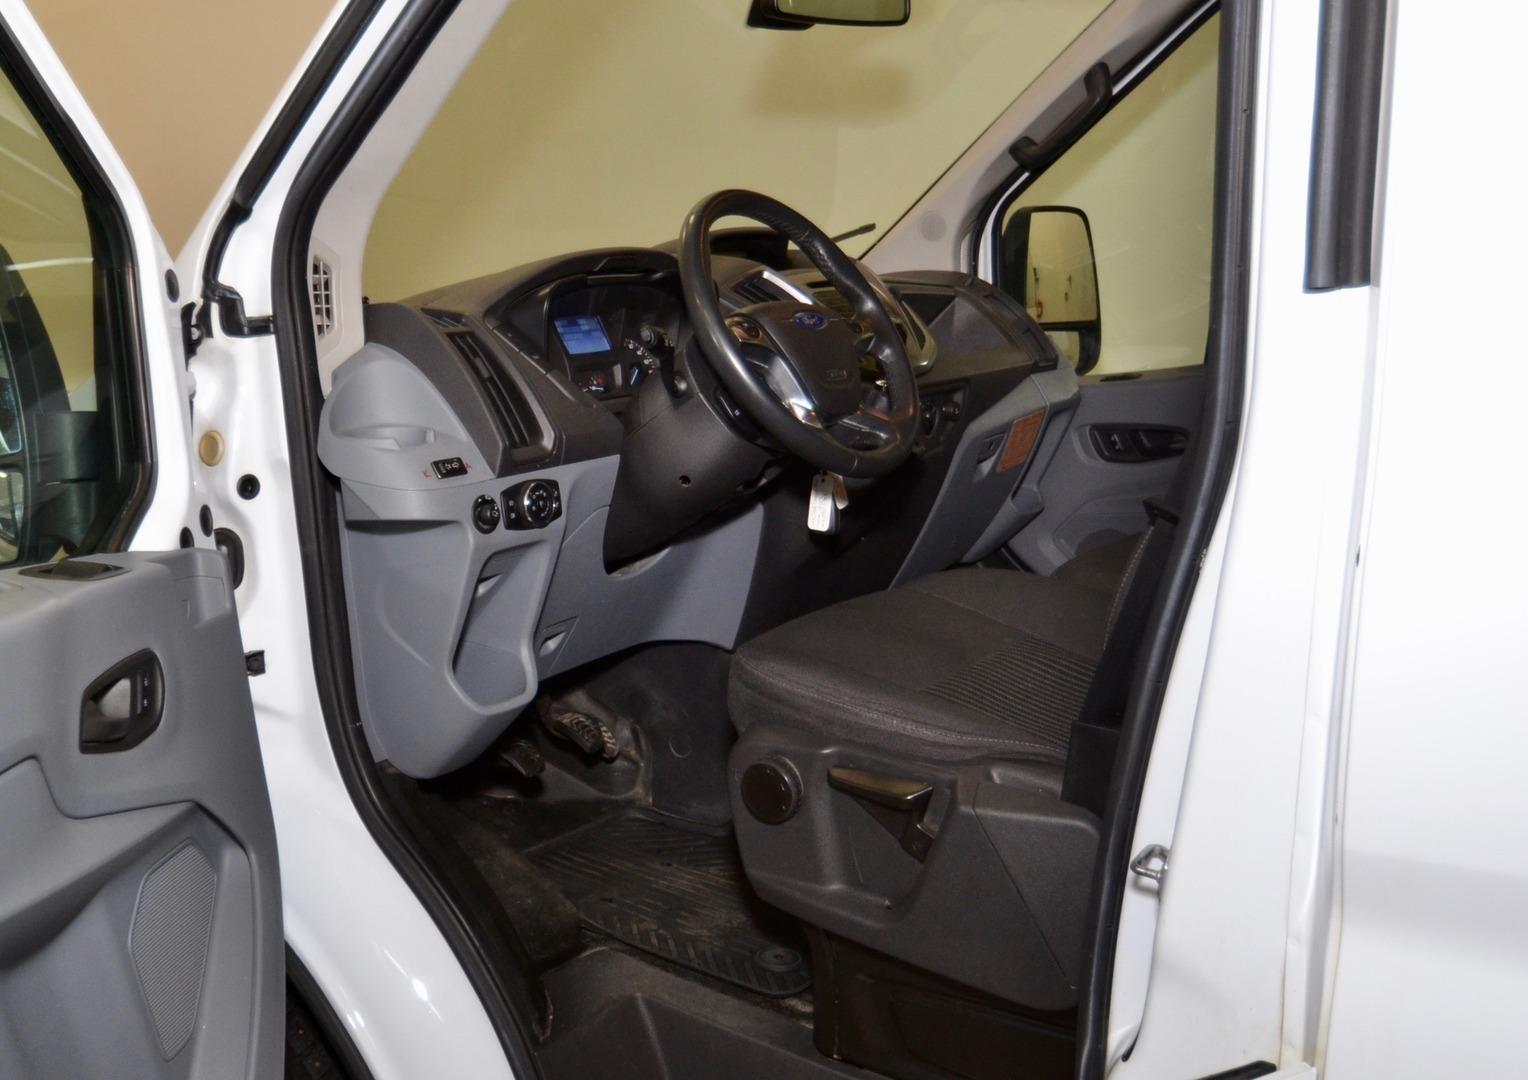 Ford Transit, 460 155 hv 18 paikkaa